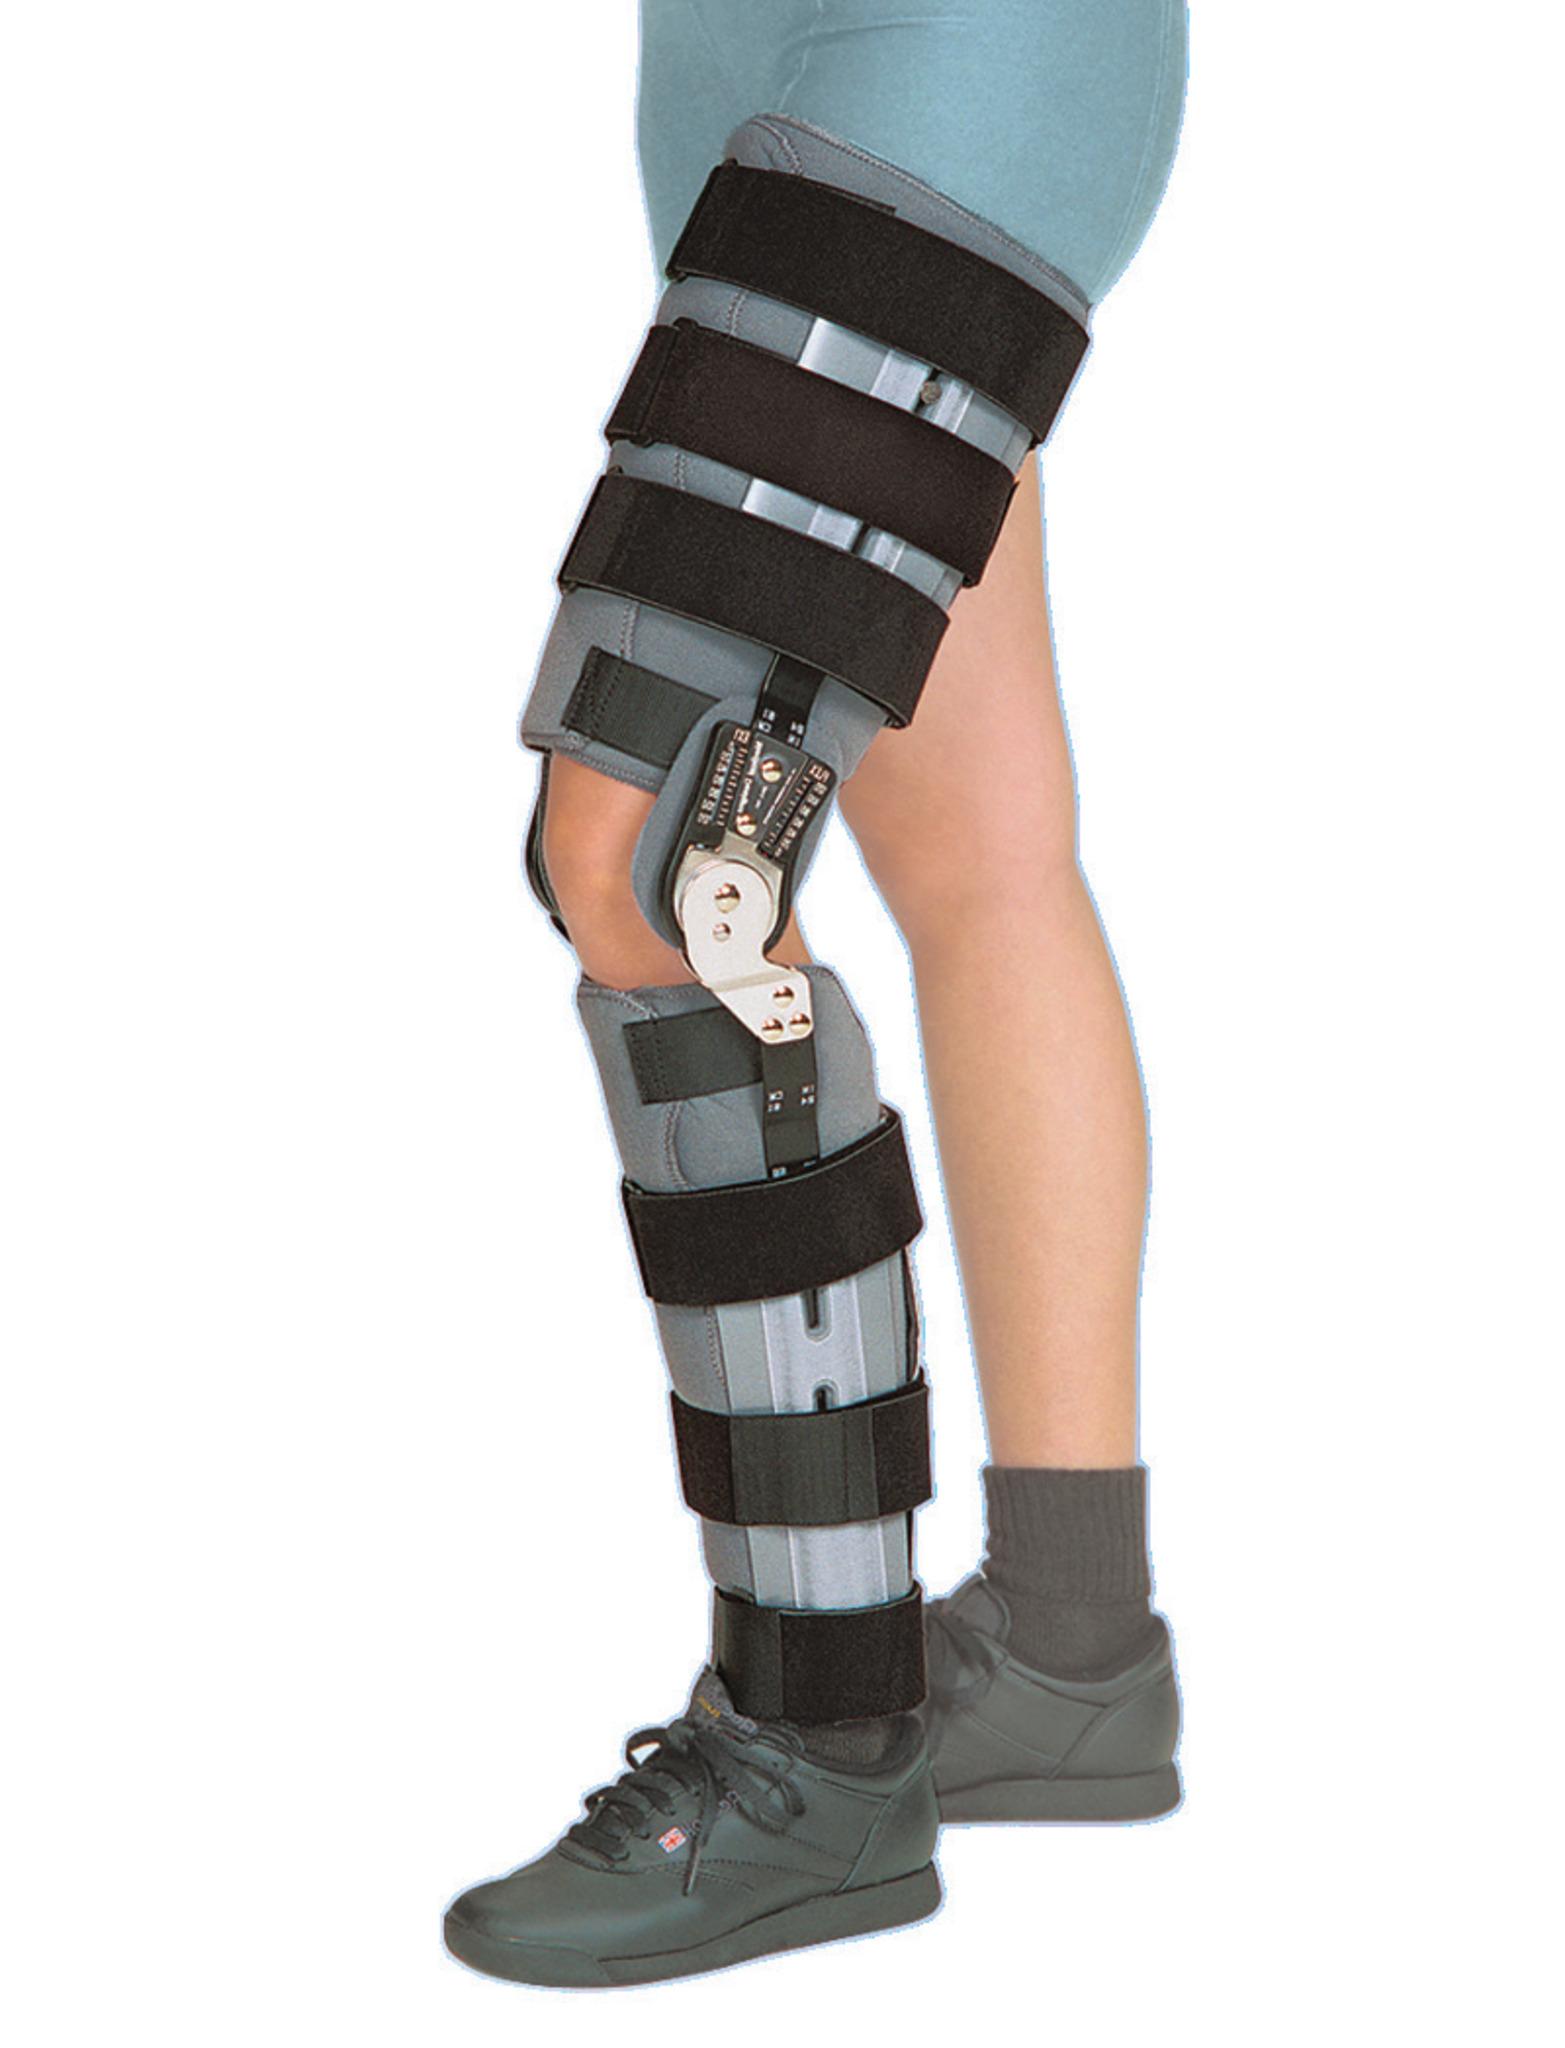 b1dc3692e9 Lower Leg Brace Related Keywords & Suggestions - Lower Leg Brace ...